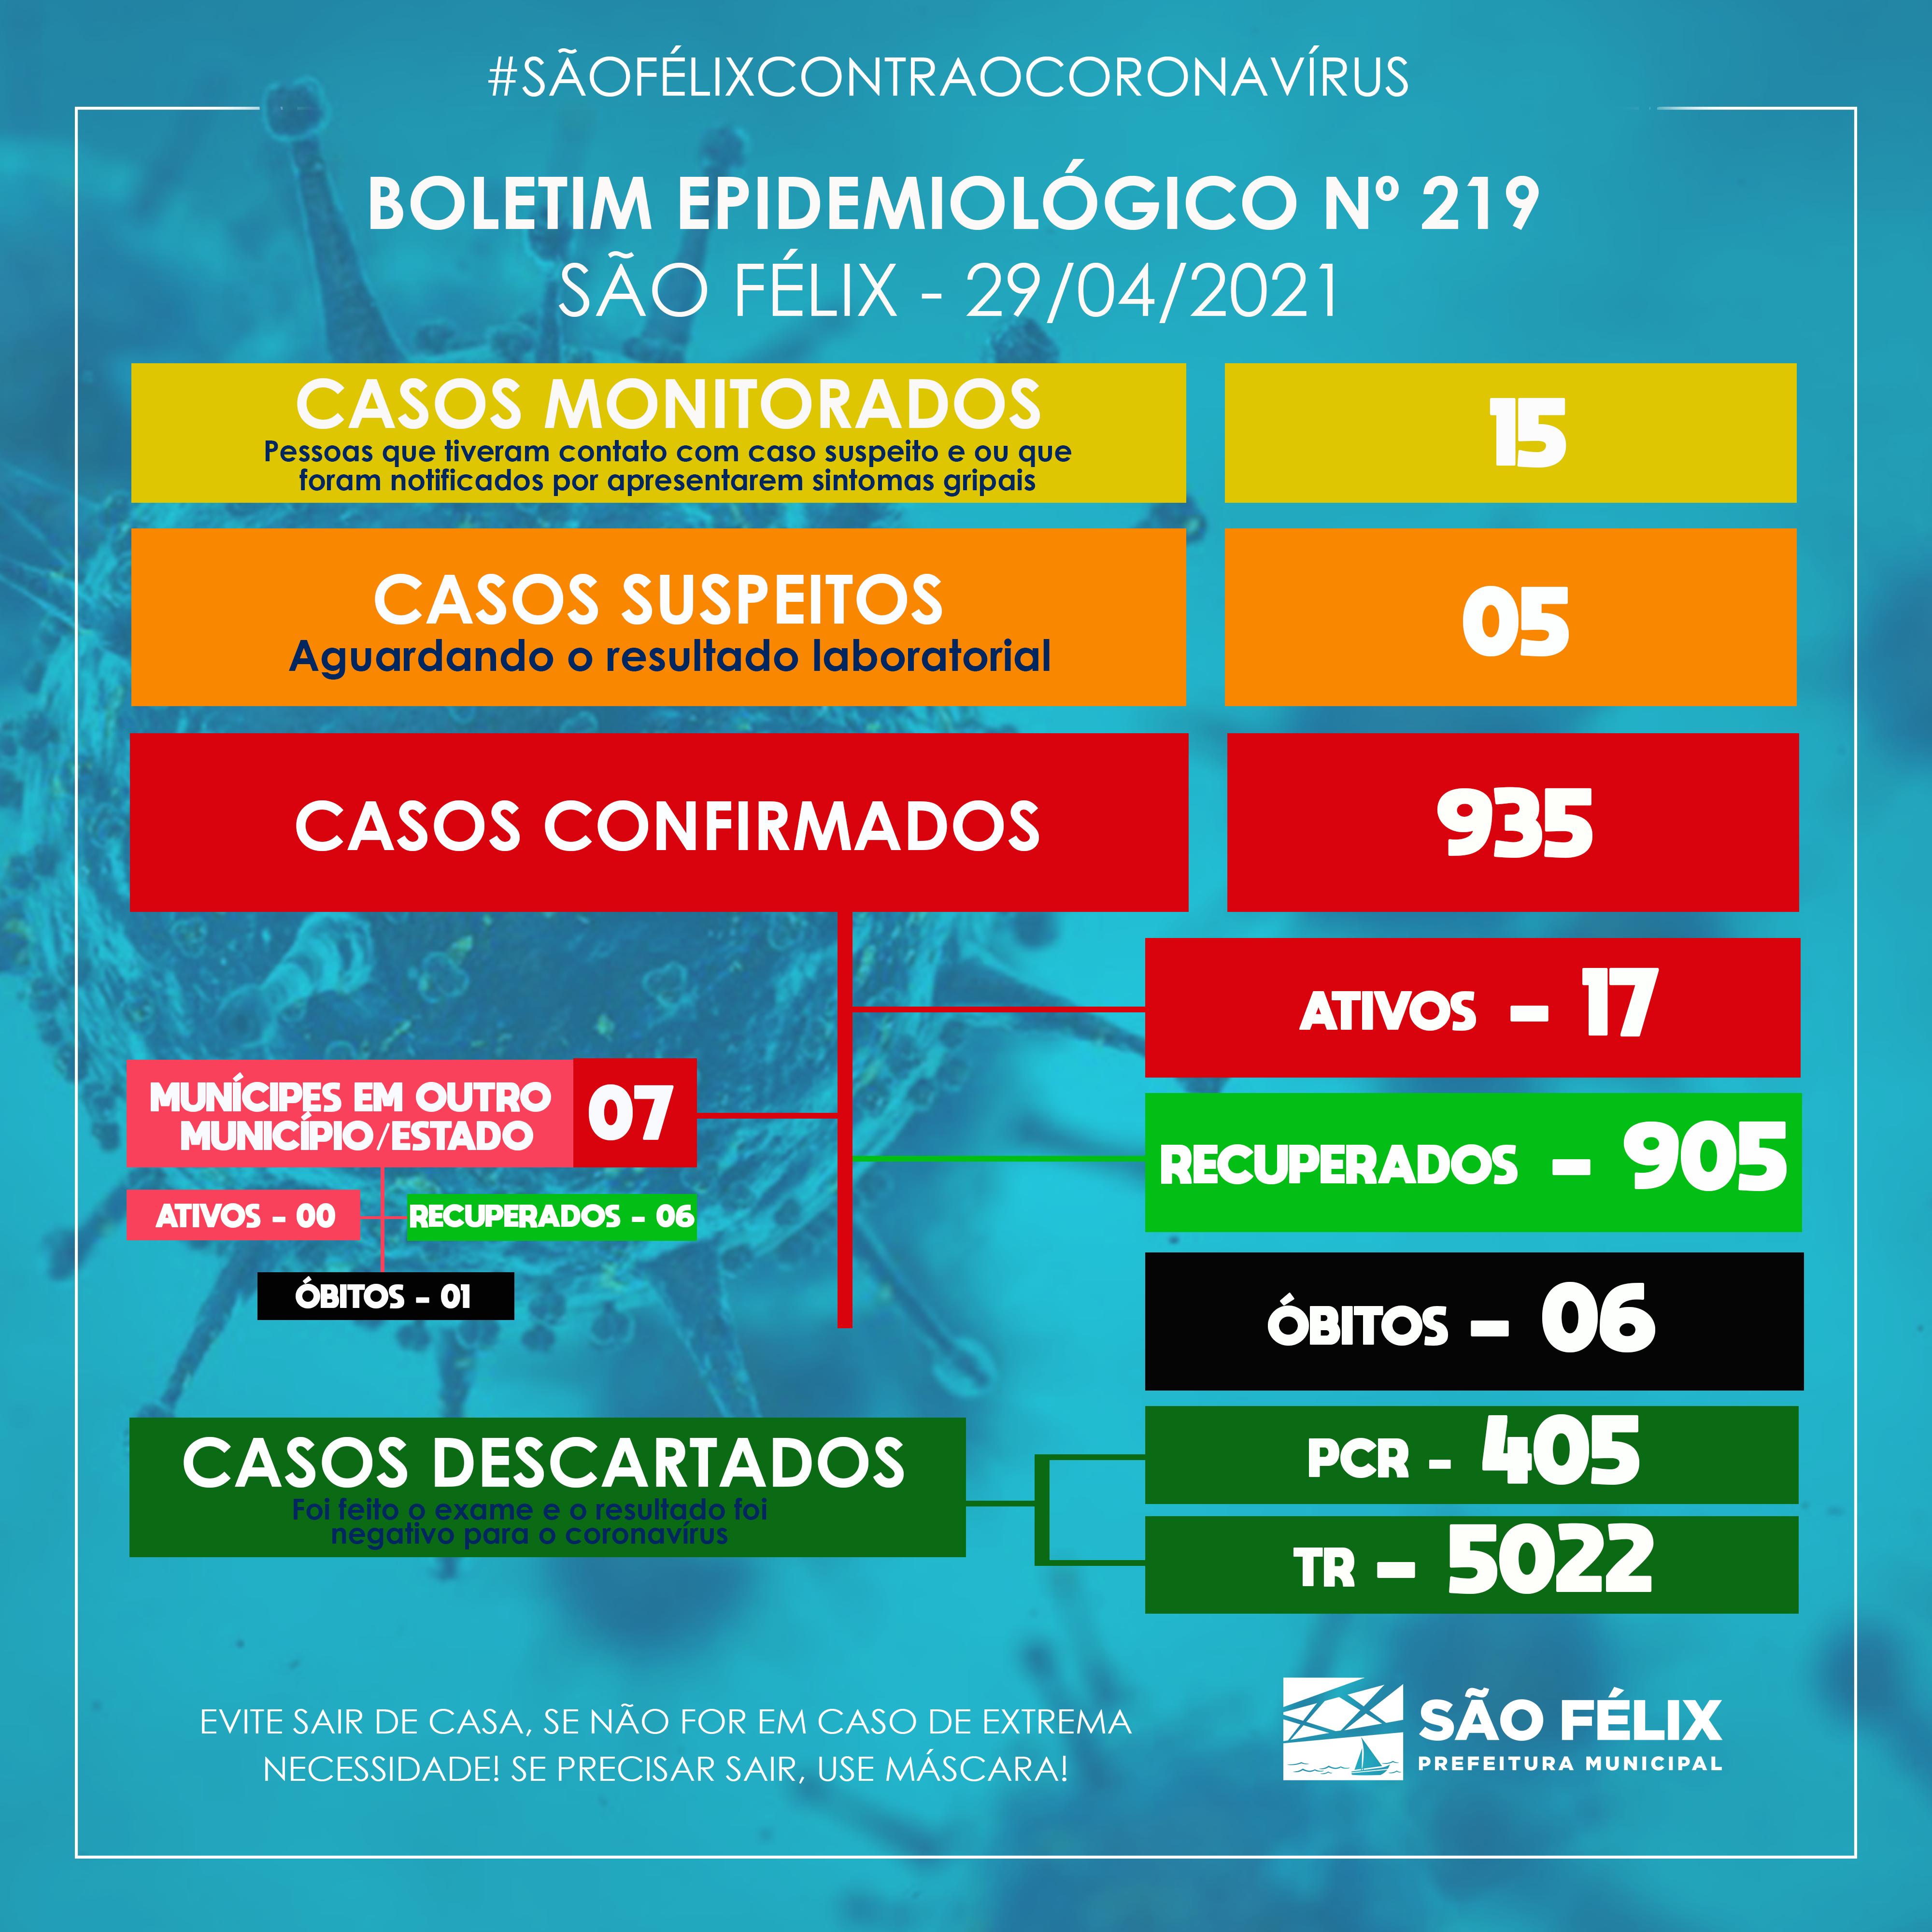 BOLETIM EPIDEMIOLÓGICO Nº 219